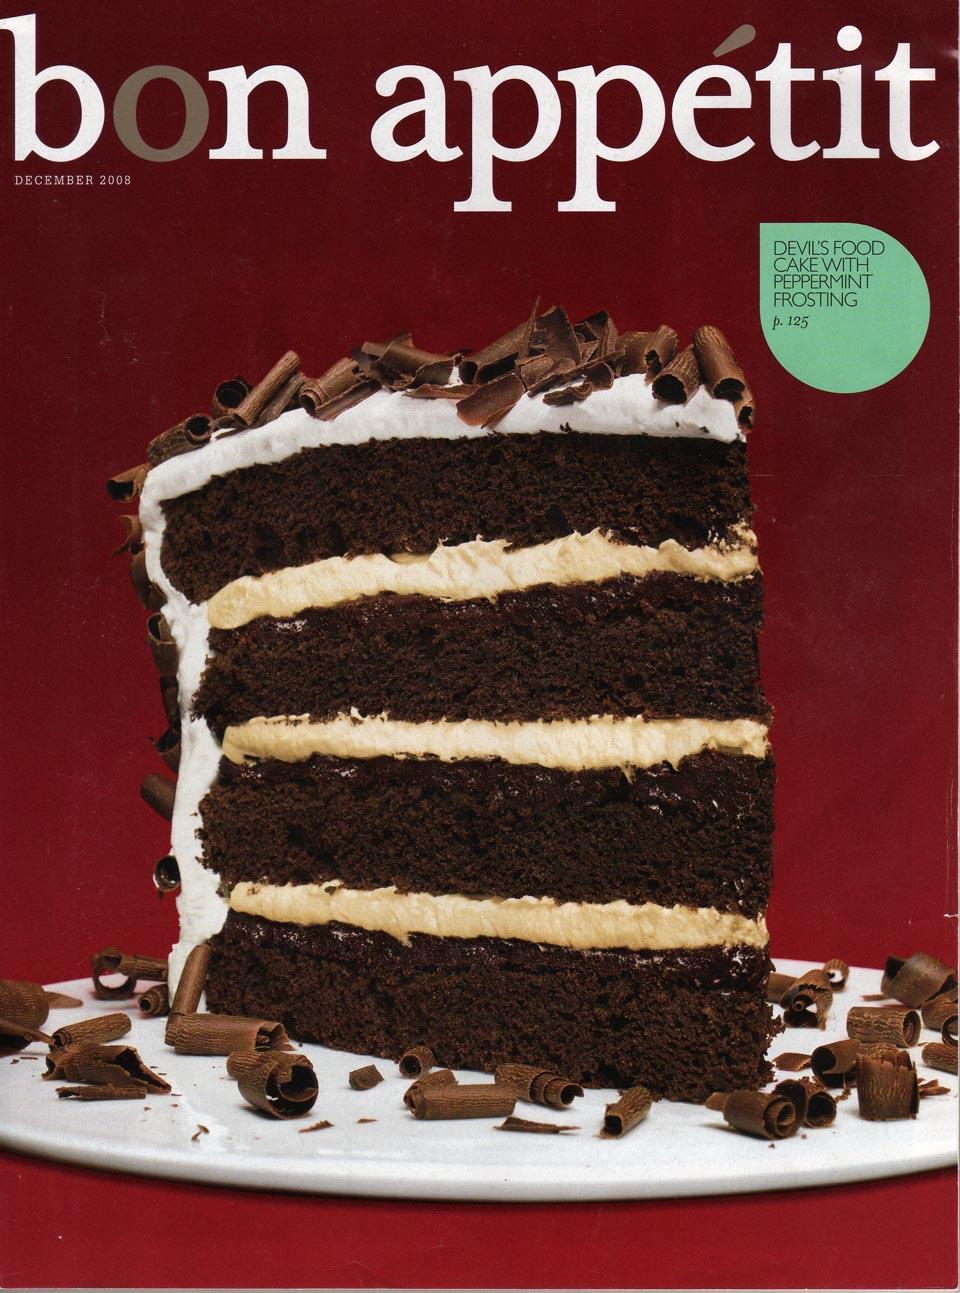 Bon Appetit Magazine Covers 2012 Bon appetit's version: